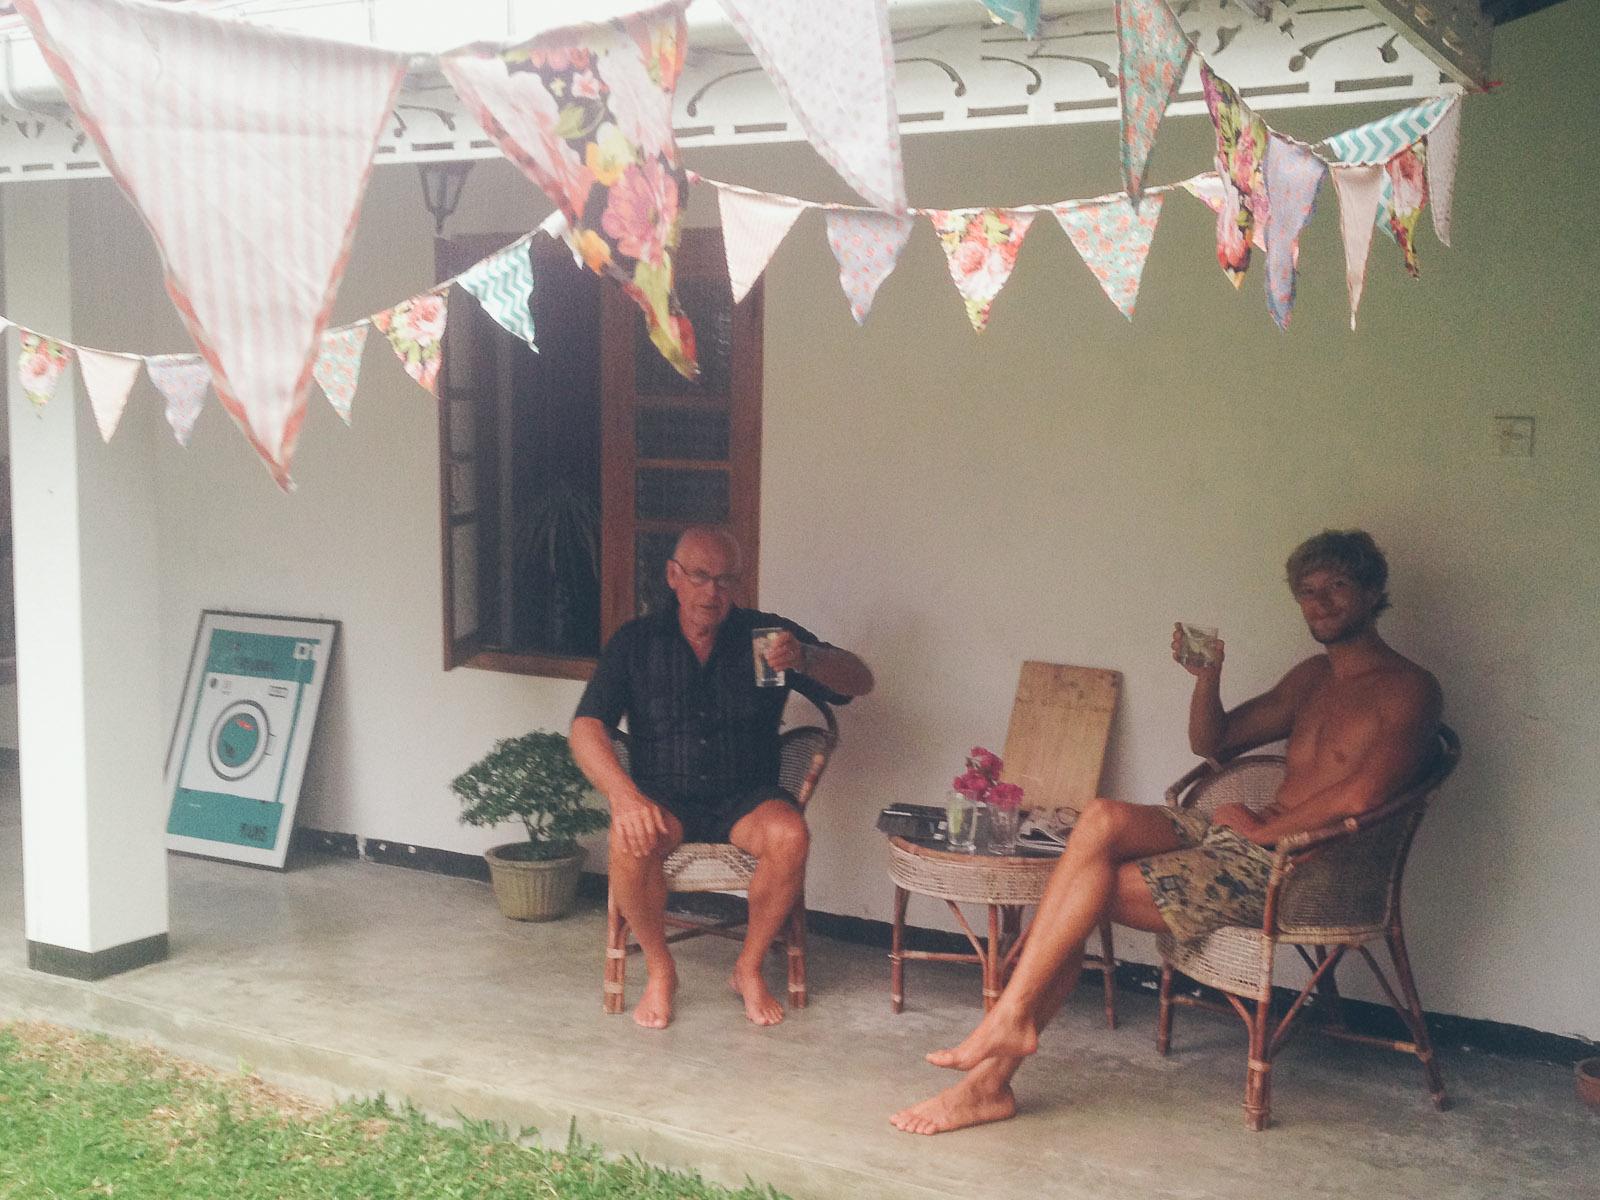 Sunshinestories-surf-travel-blog-IMG_4797